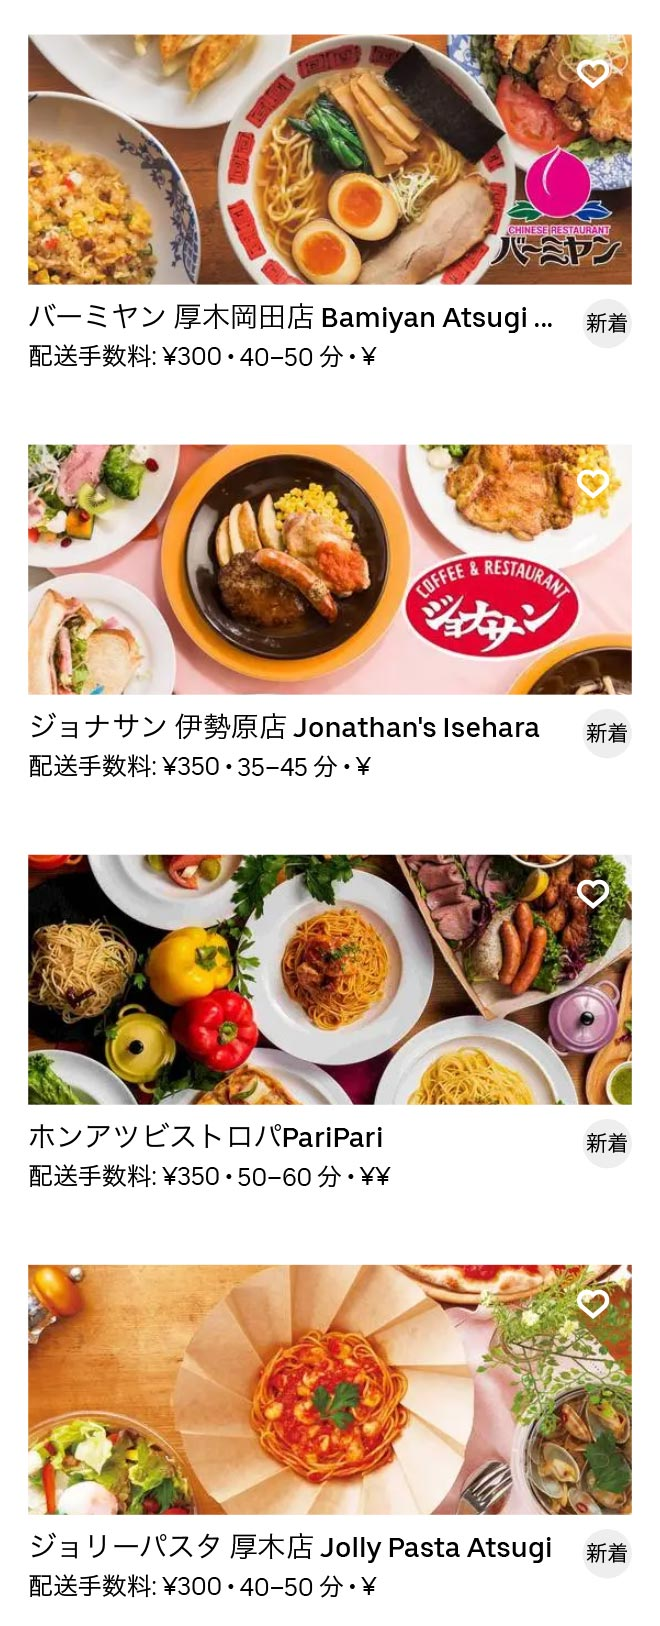 Aiko ishida menu 2010 03